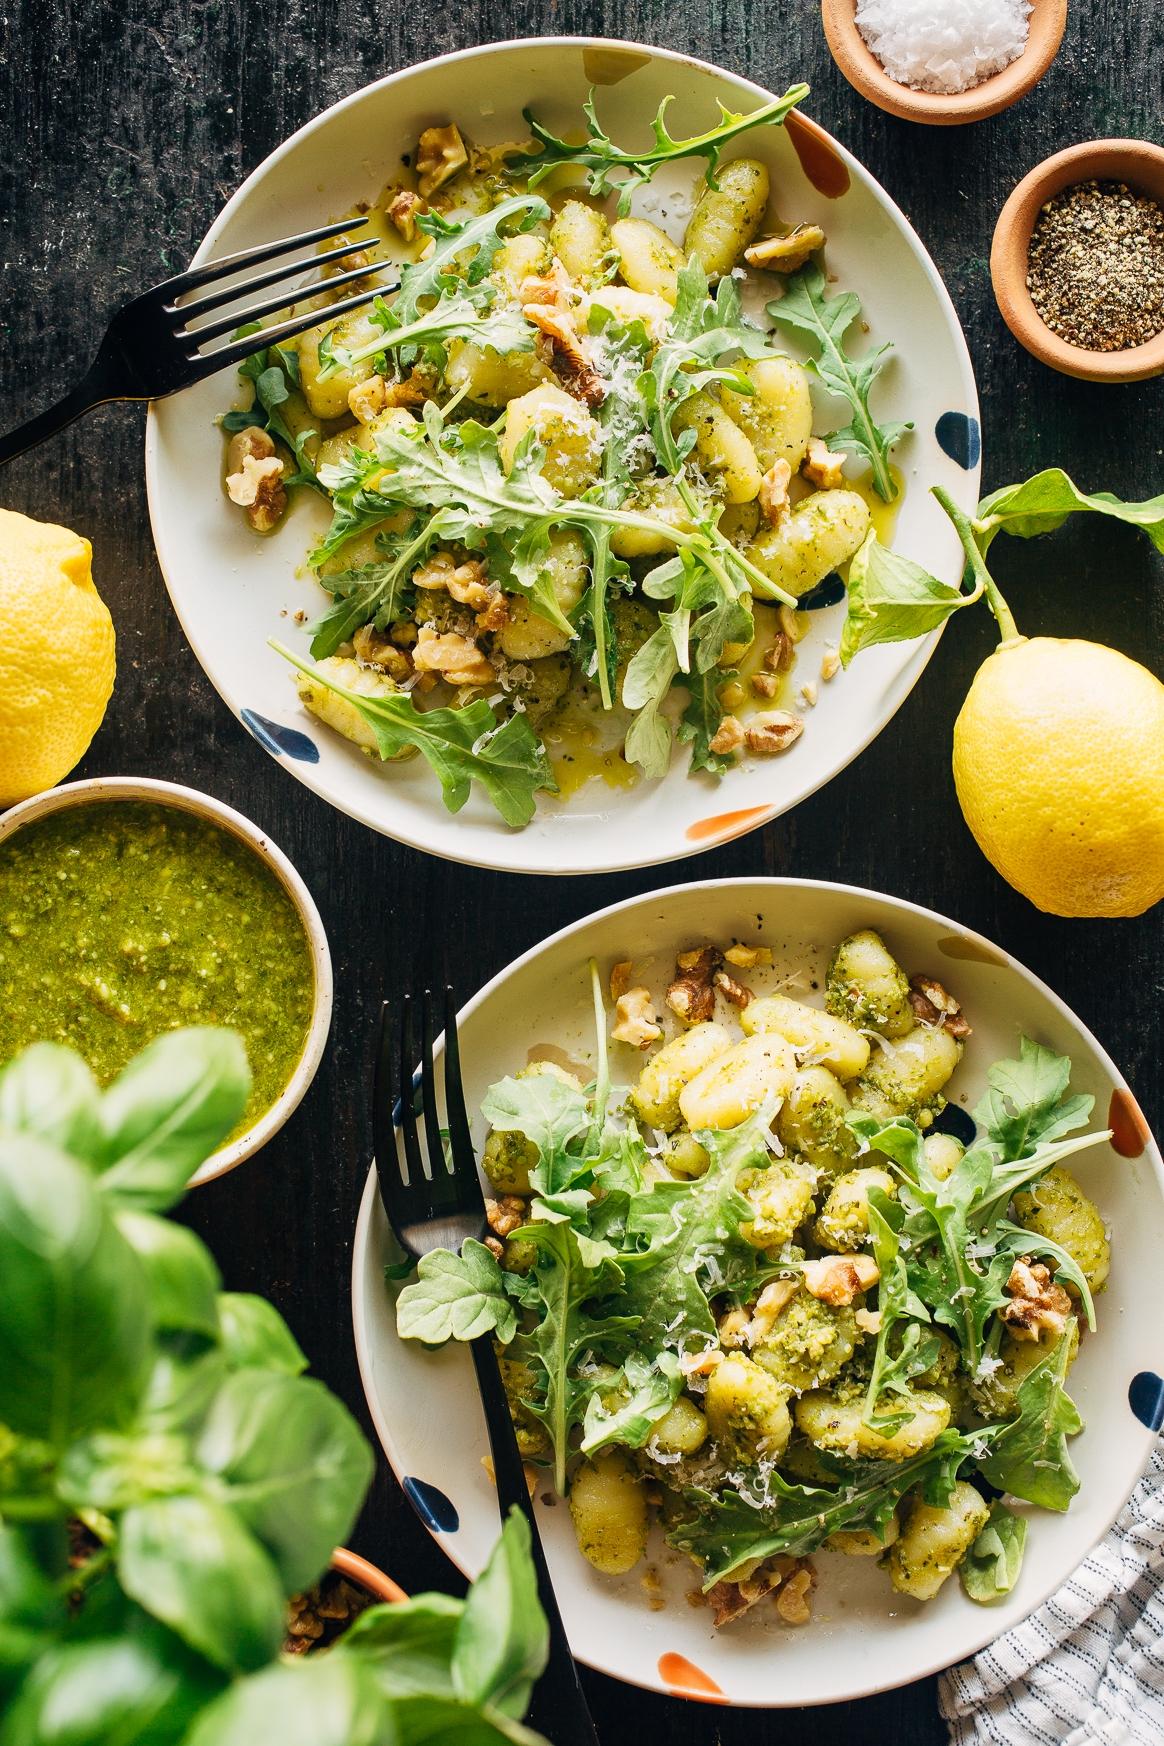 Pesto Gnocchi with Arugula, Lemon and Toasted Walnuts